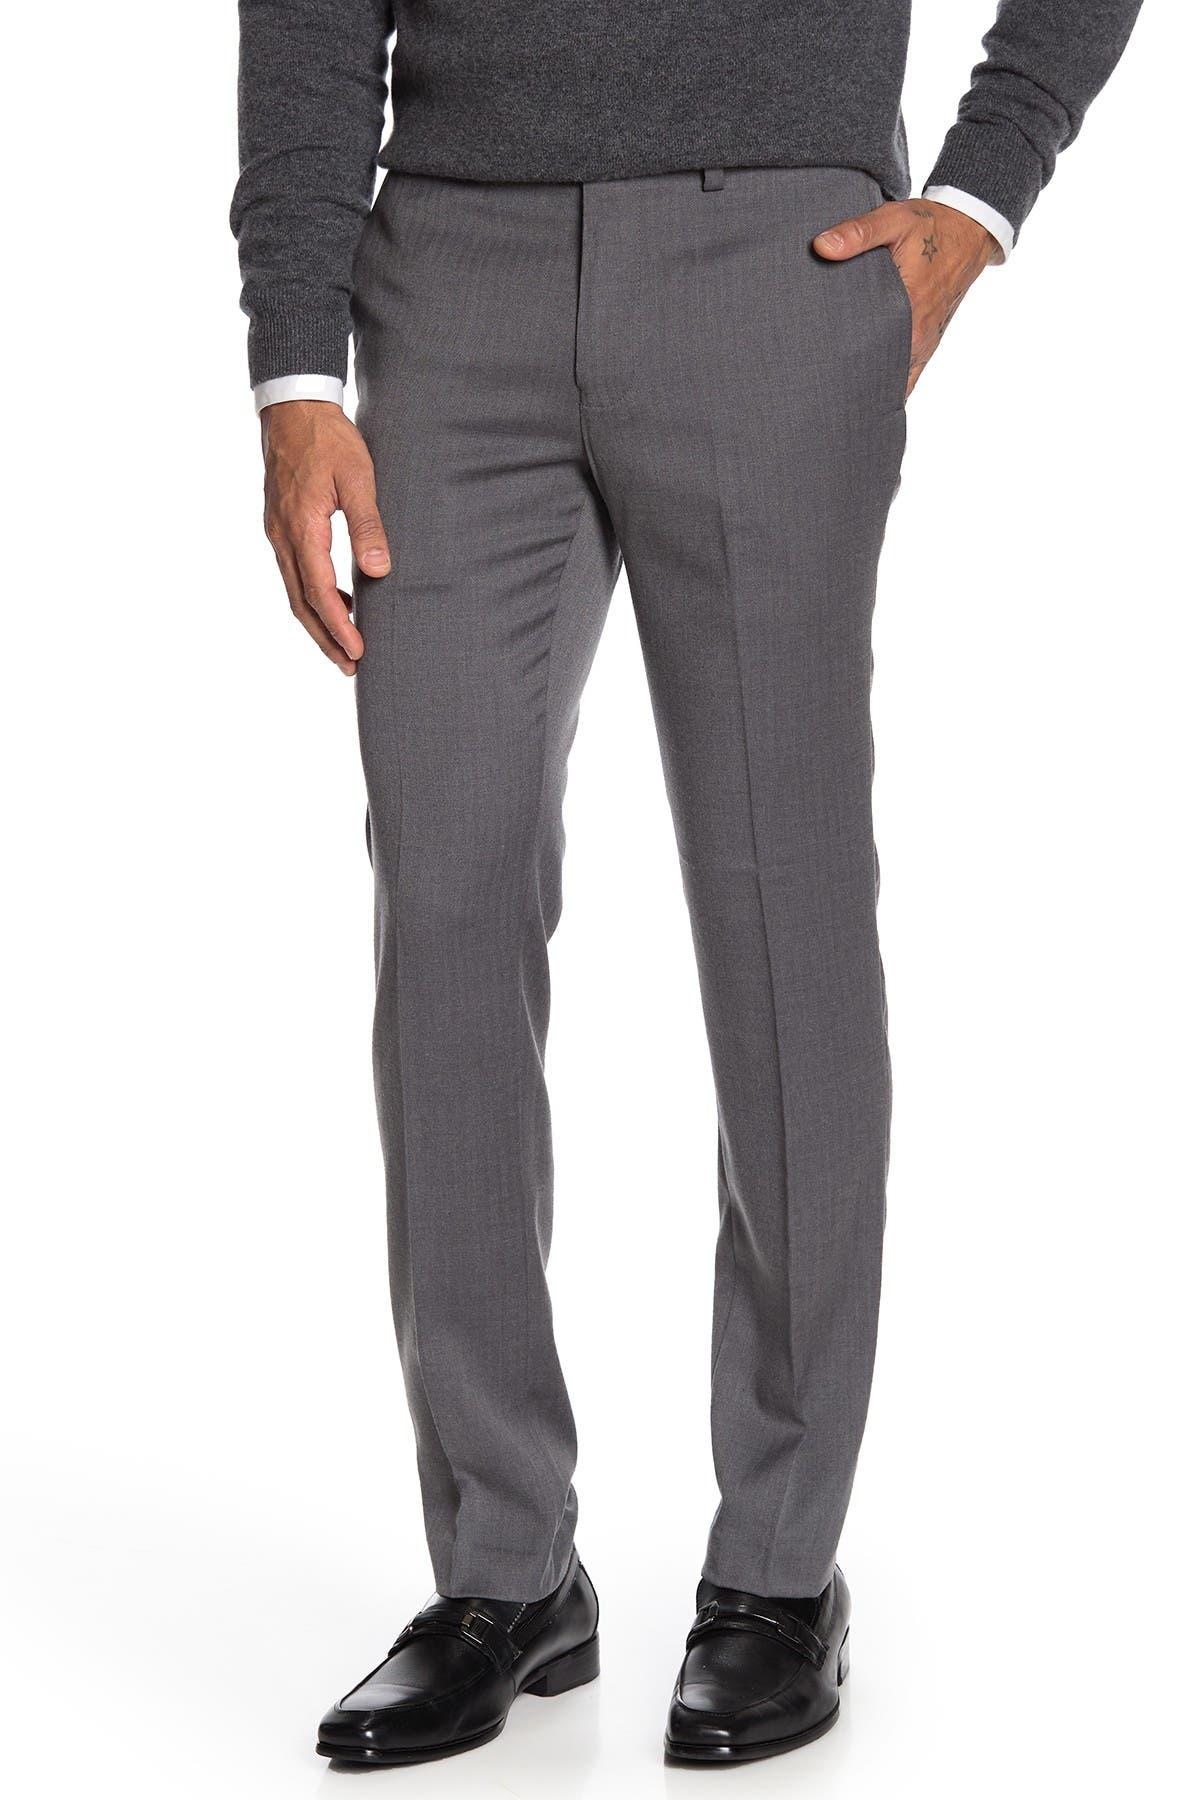 "Image of Louis Raphael Mini Herringbone Slim Fit Pants - 30-34"" Inseam"